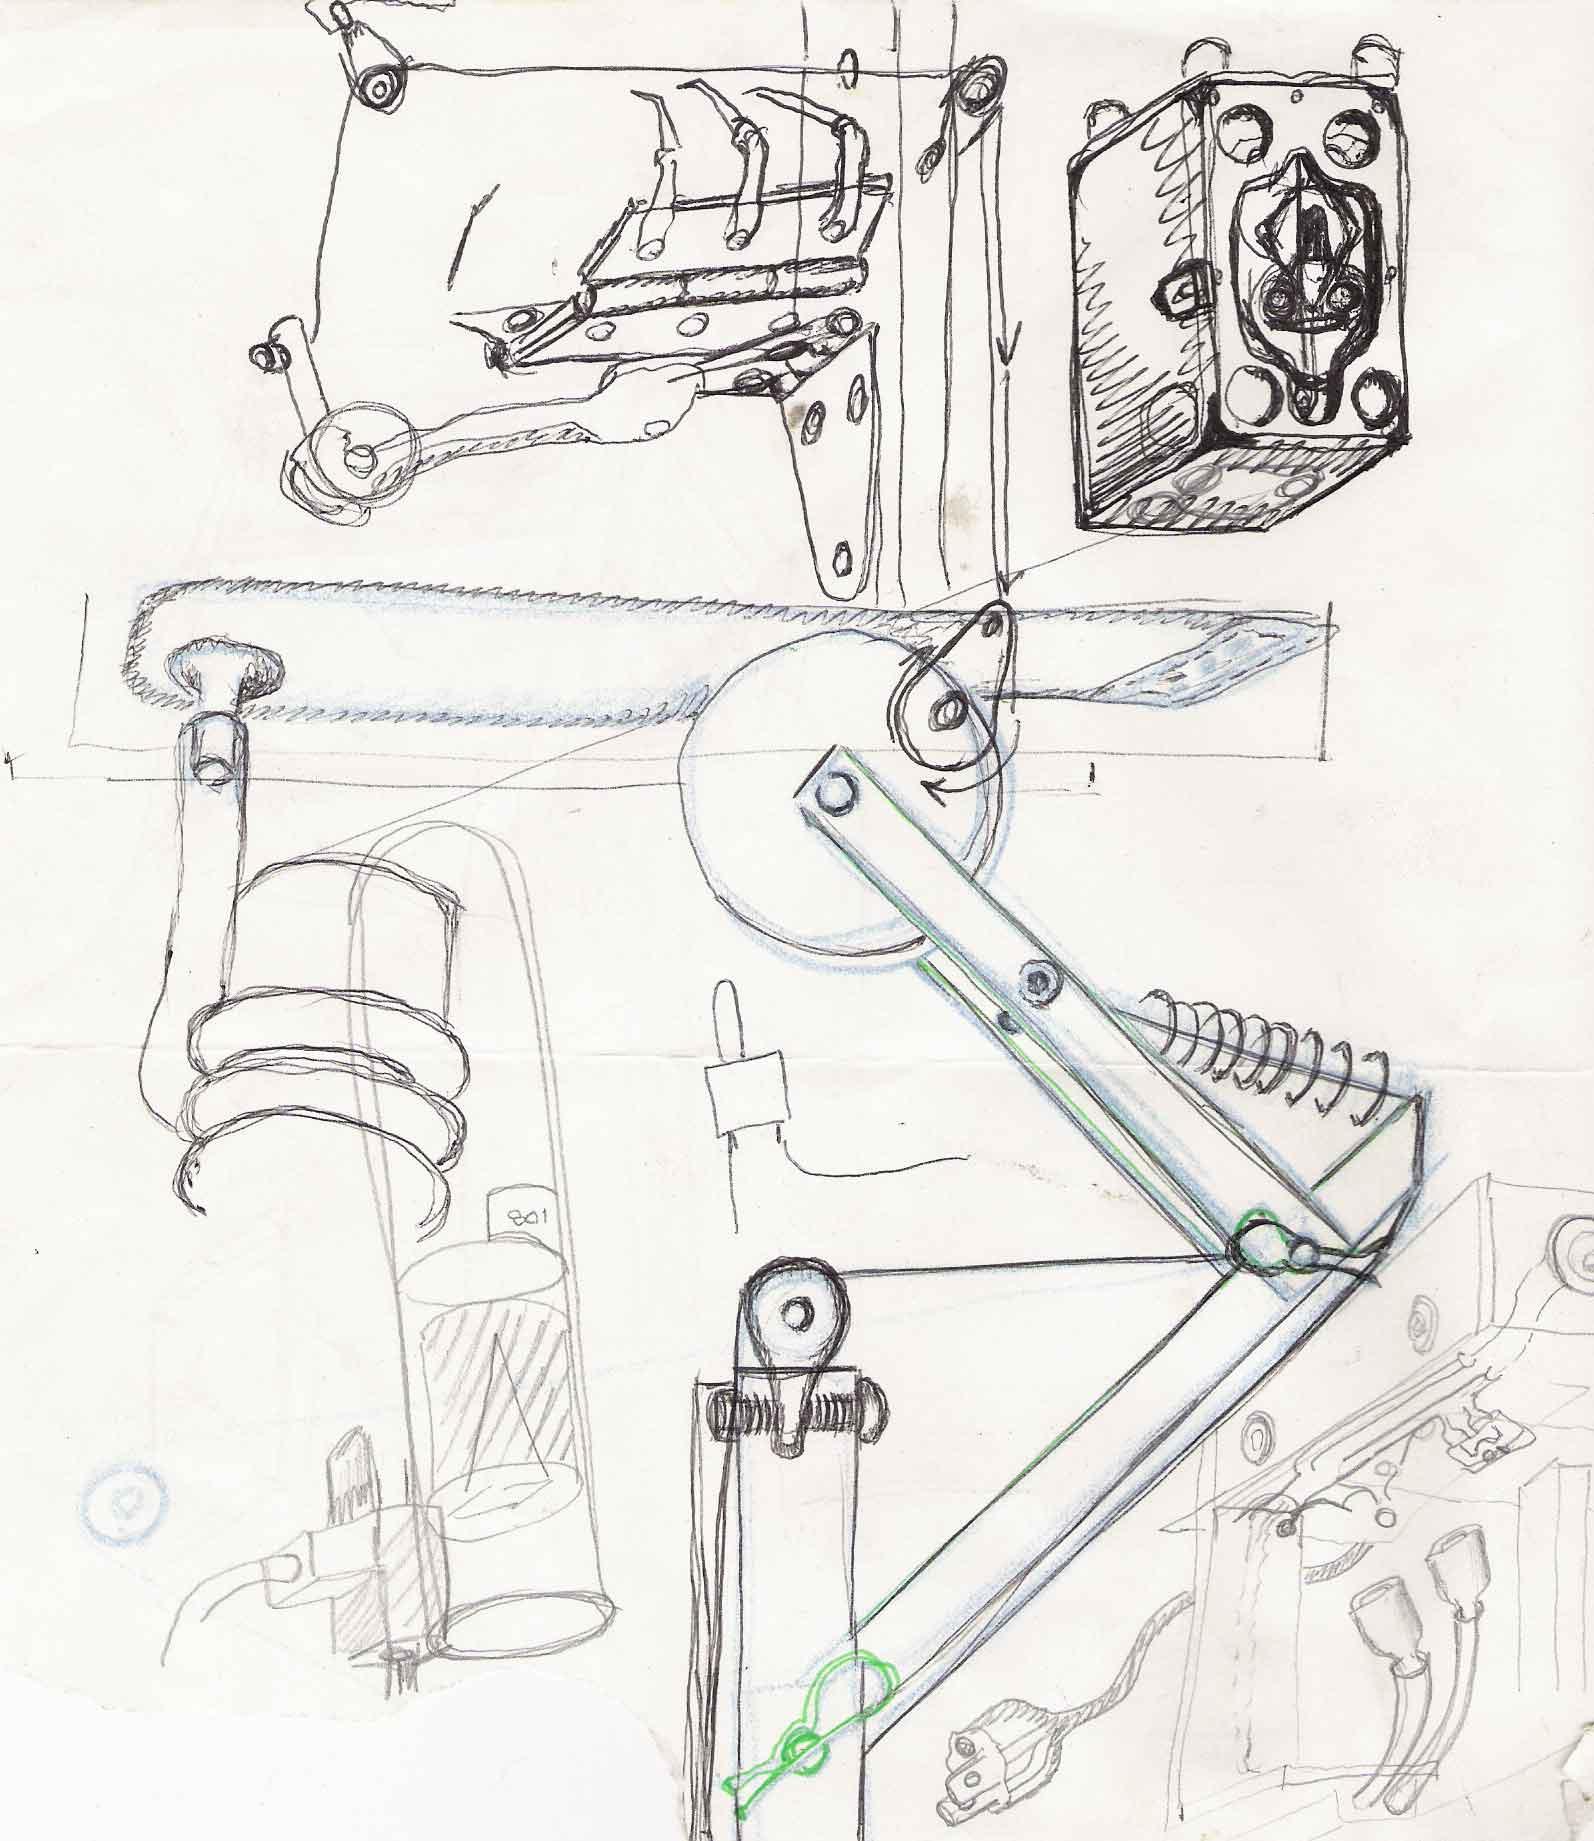 sketch-40-sept-05.jpg